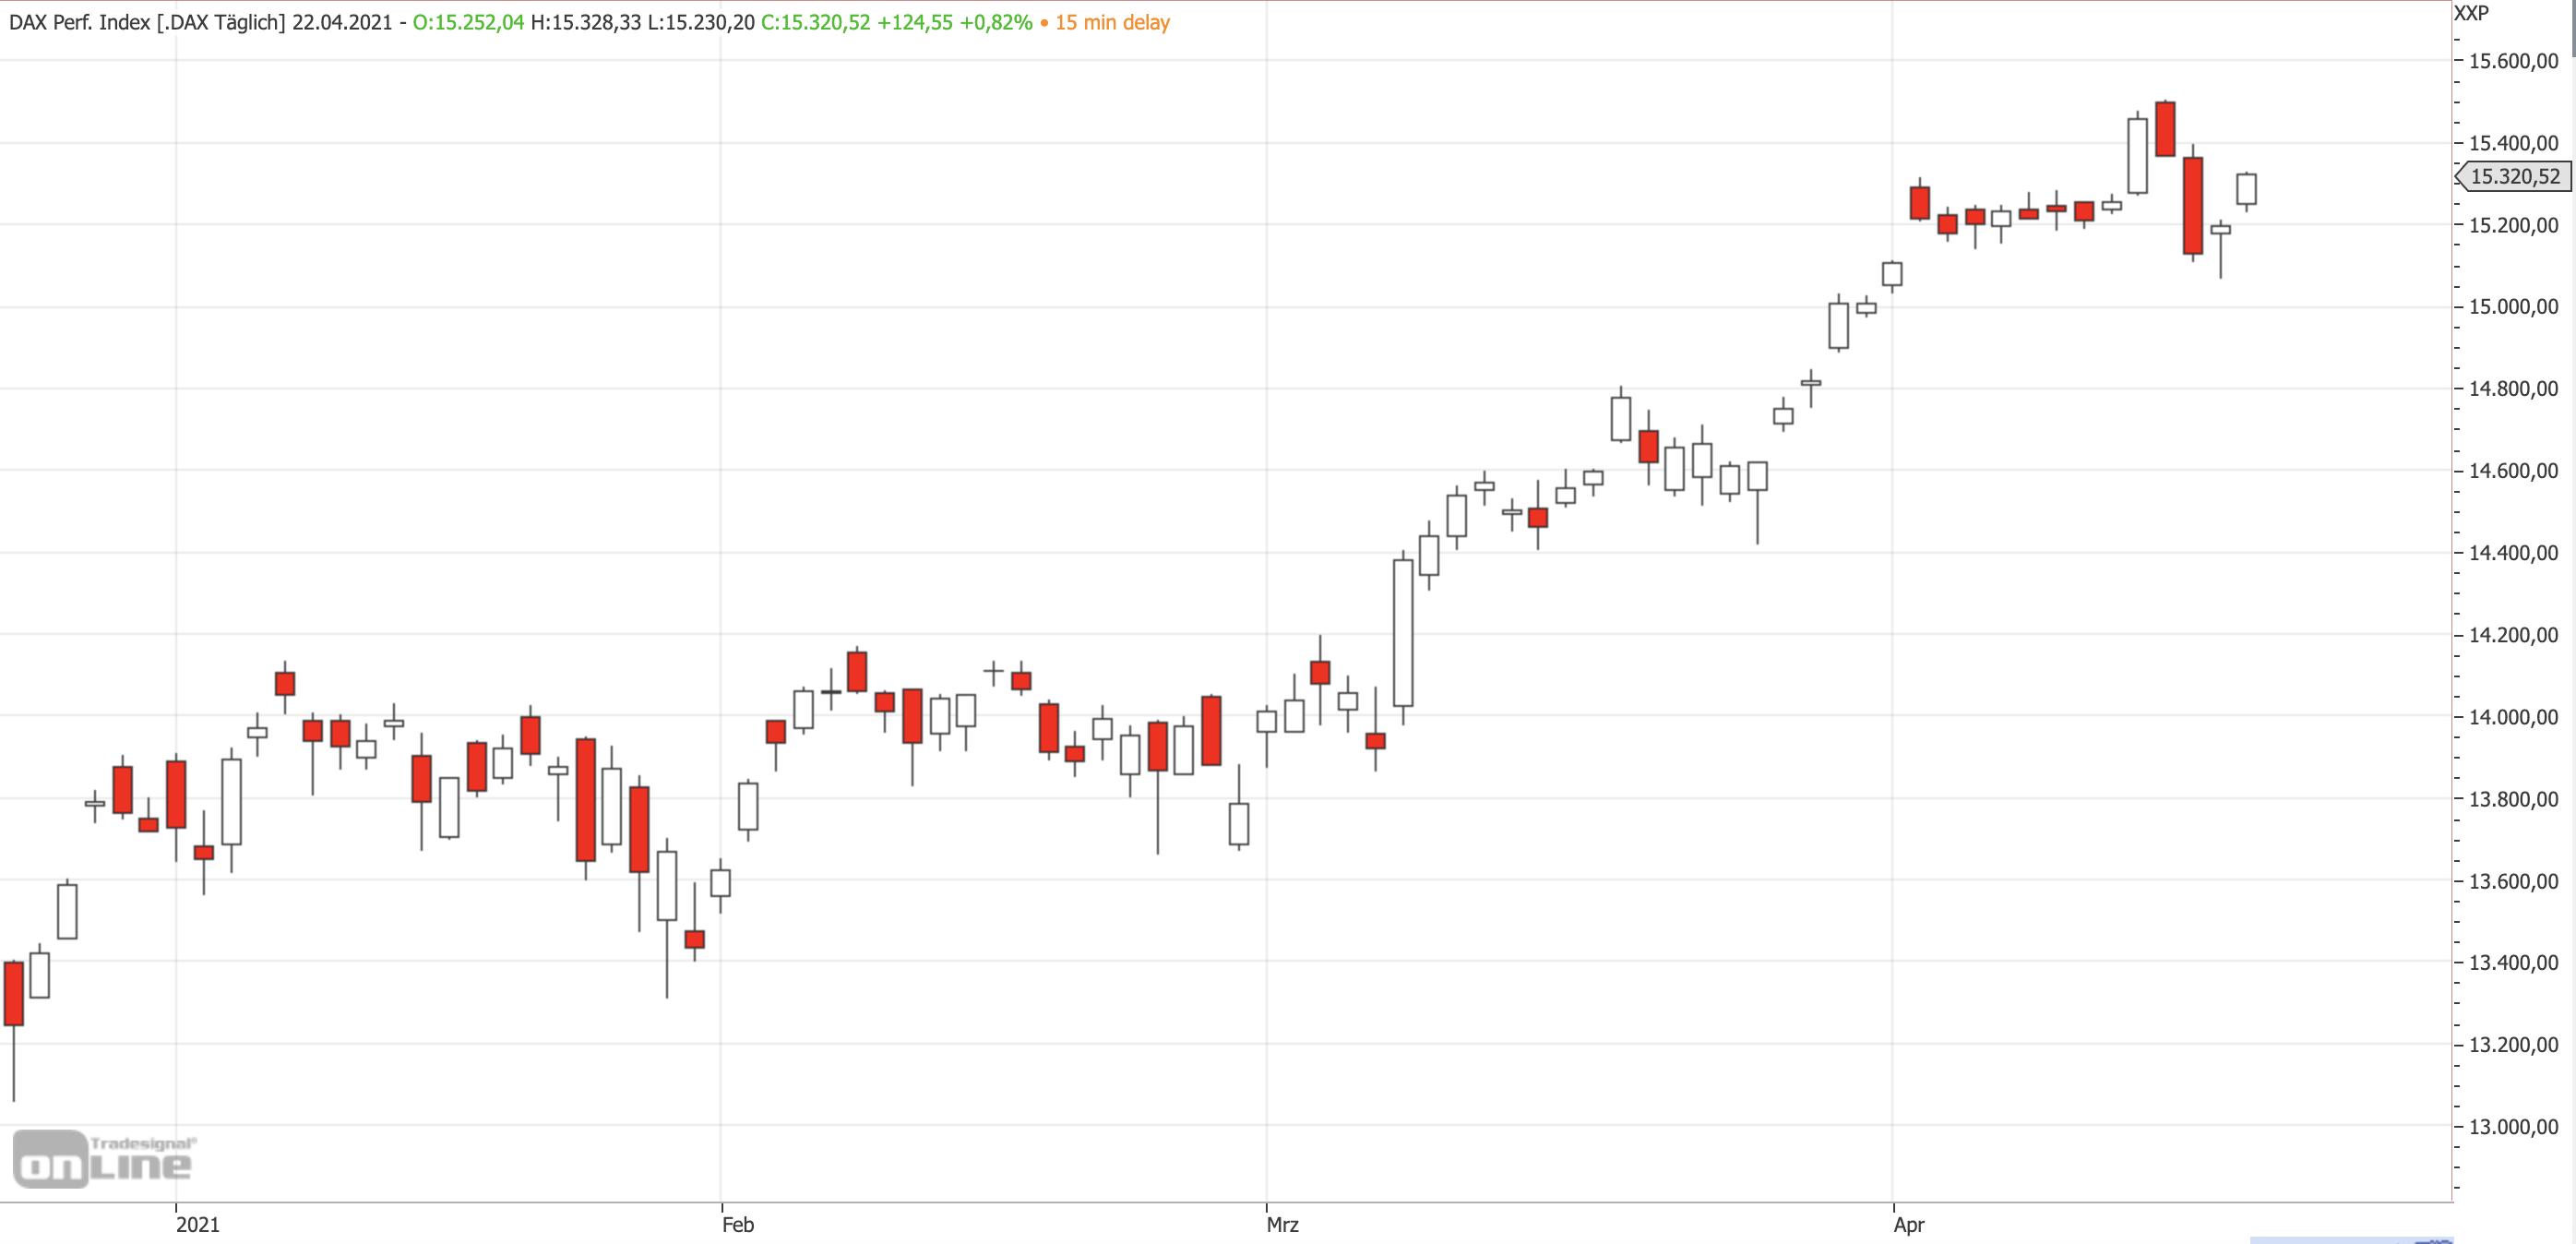 Mittelfristiger DAX-Chart am 22.04.2021